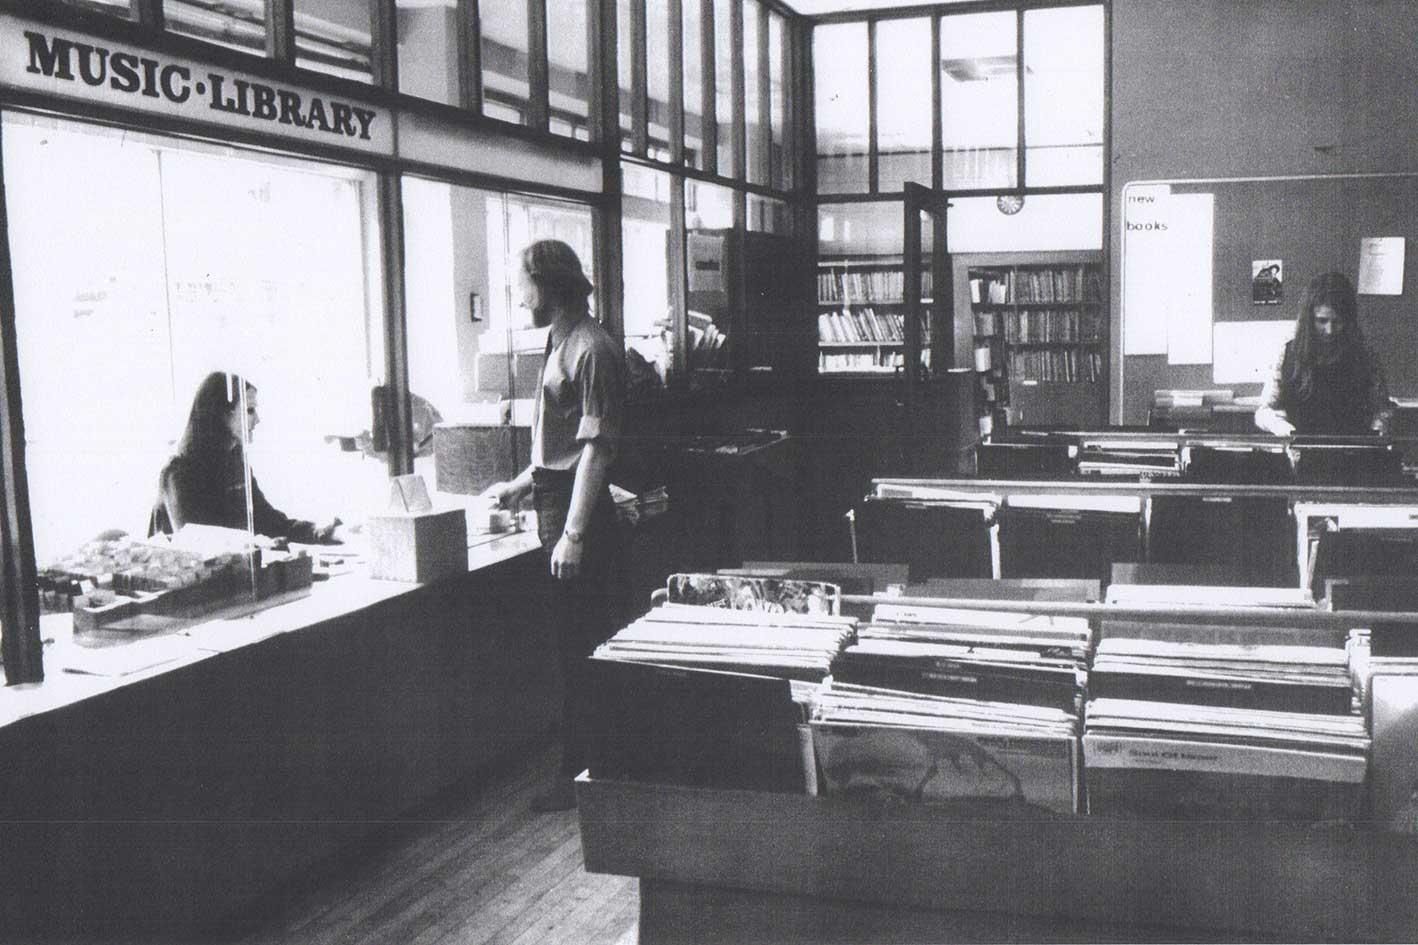 music library interior